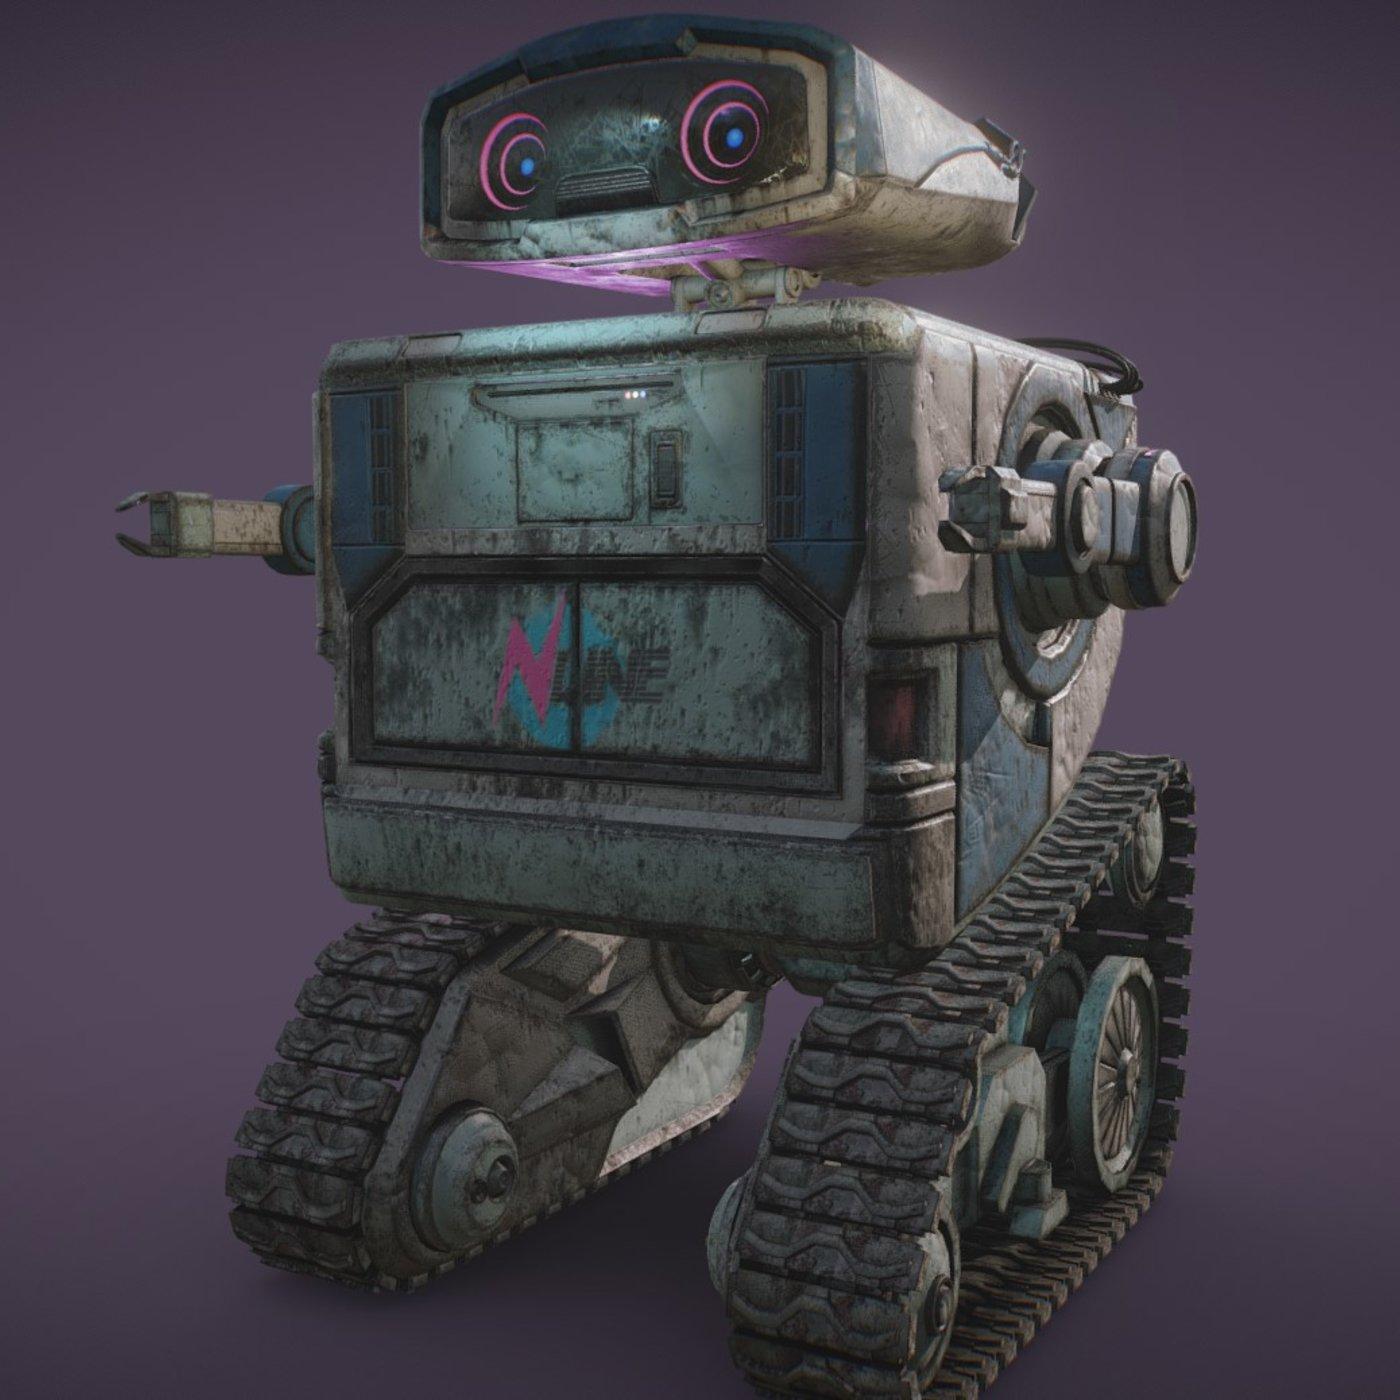 Robot W-Type